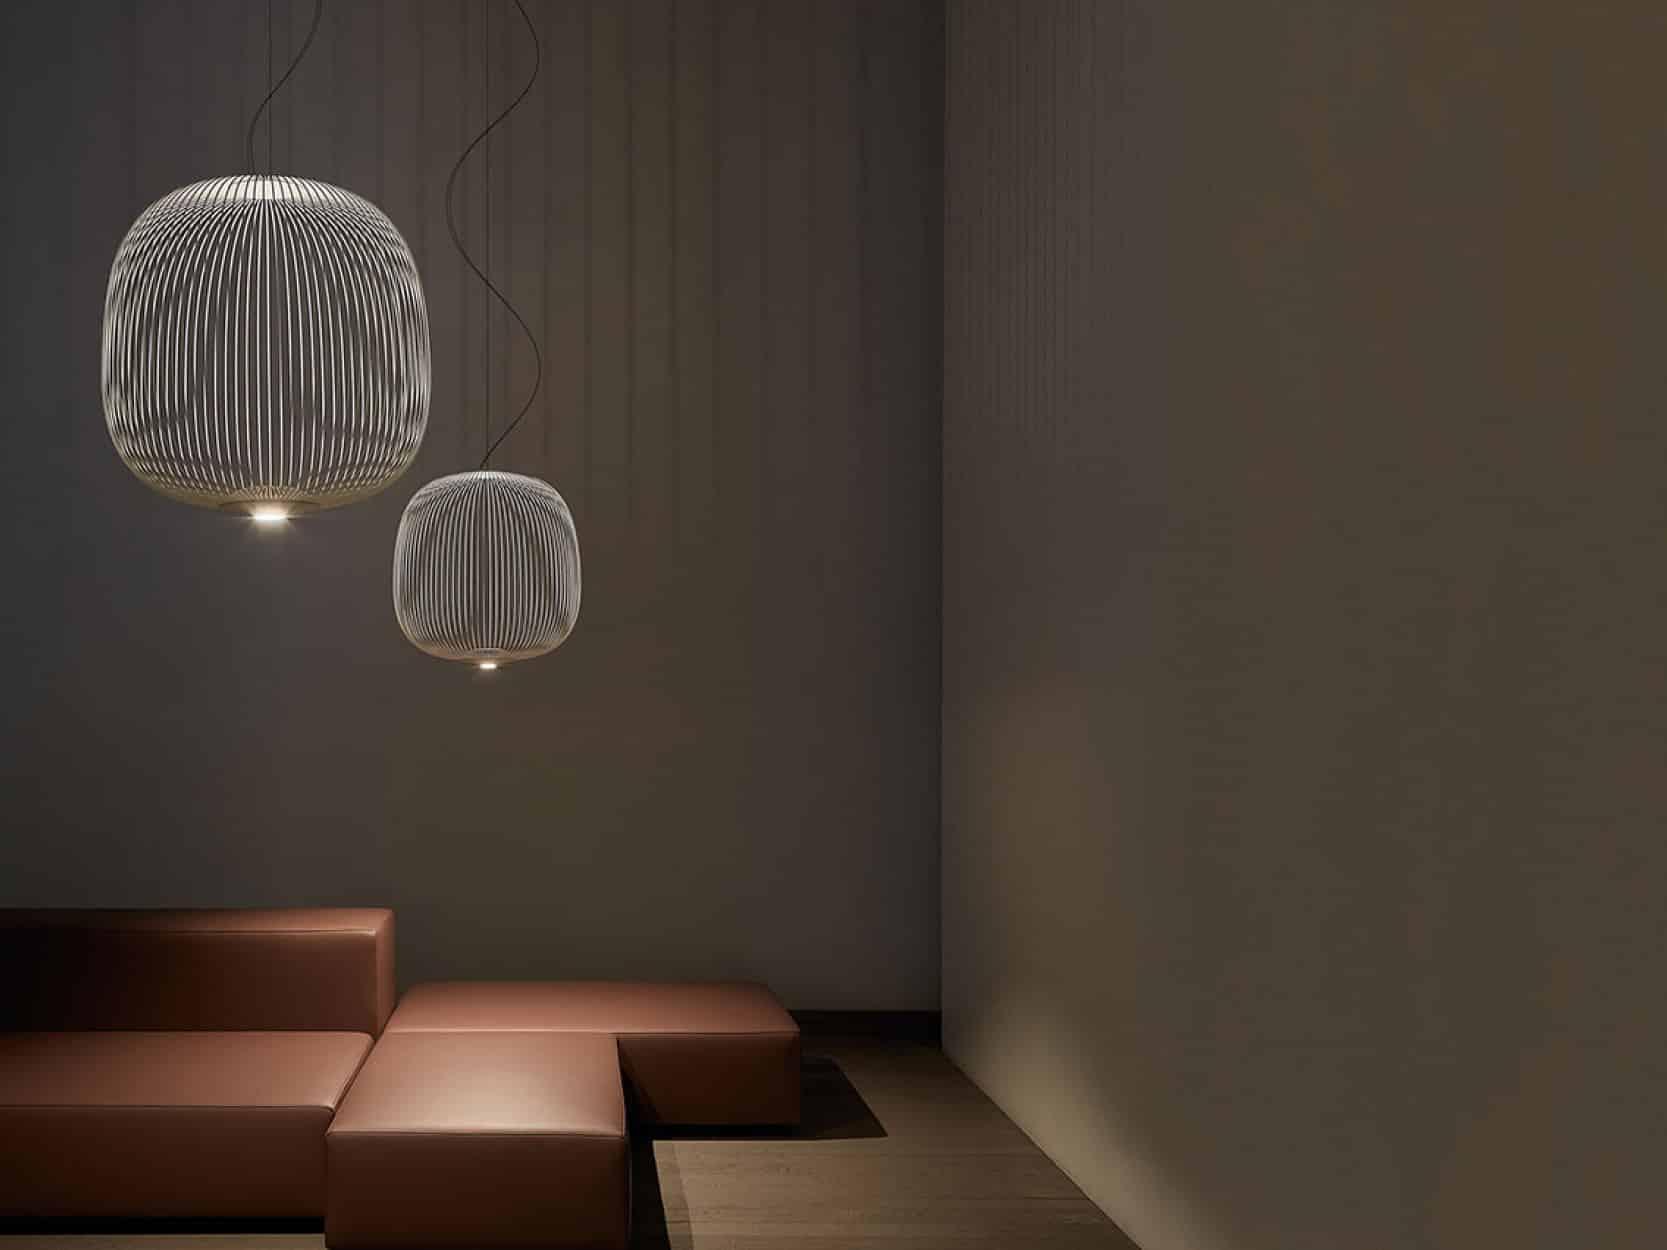 Foscarini hanglamp Spokes2 sfeer donker